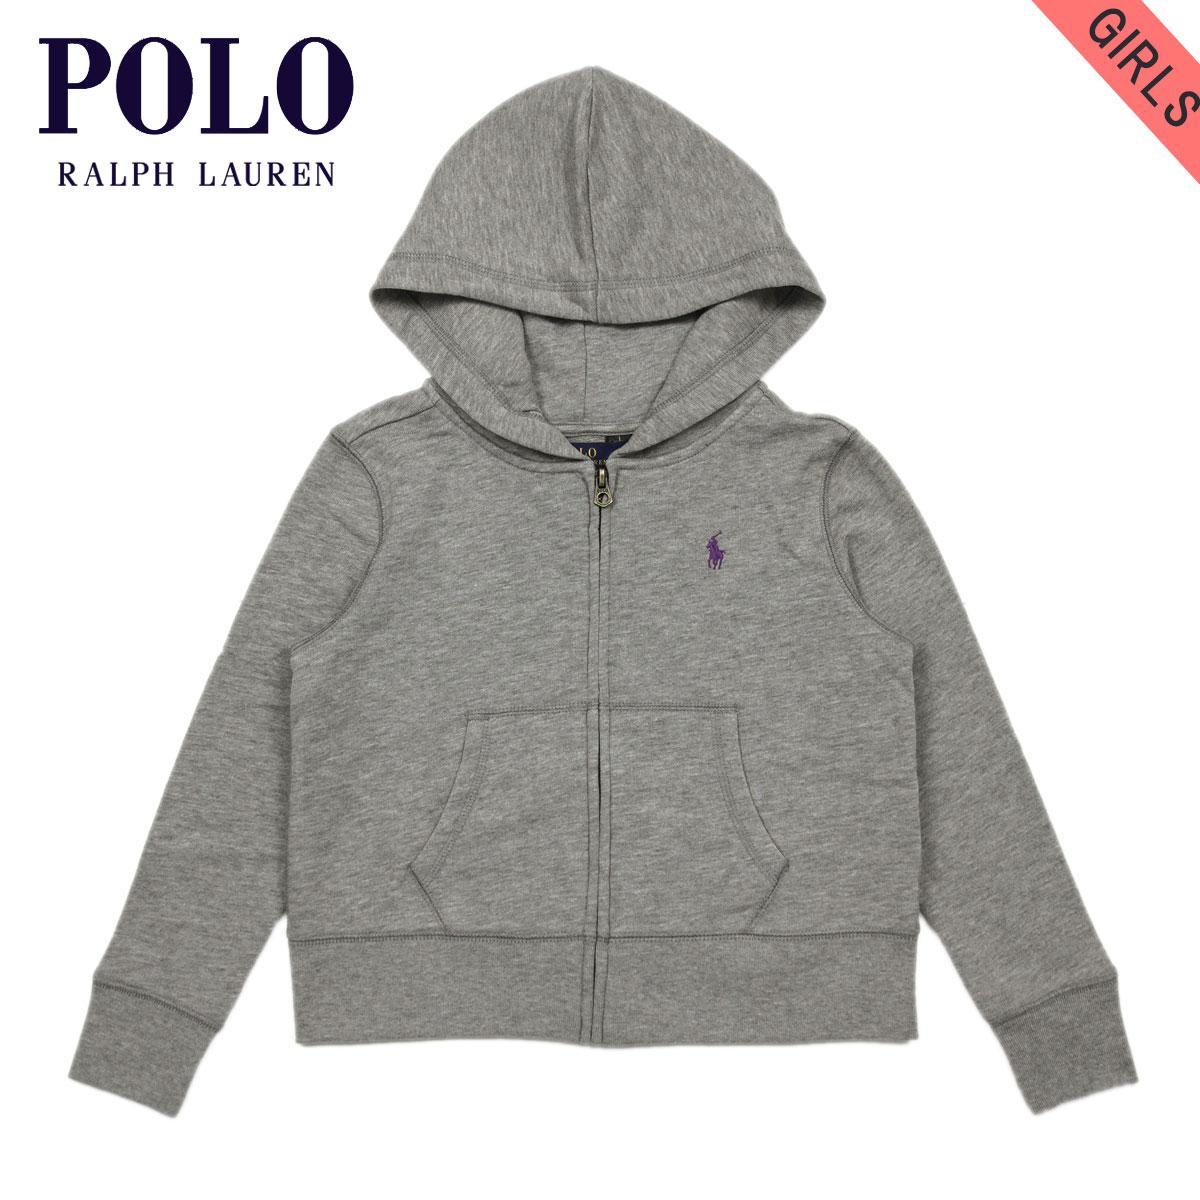 ced37531483f35 ... discount code for polo ralph lauren kids polo ralph lauren children  genuine kids clothing girls hoodie